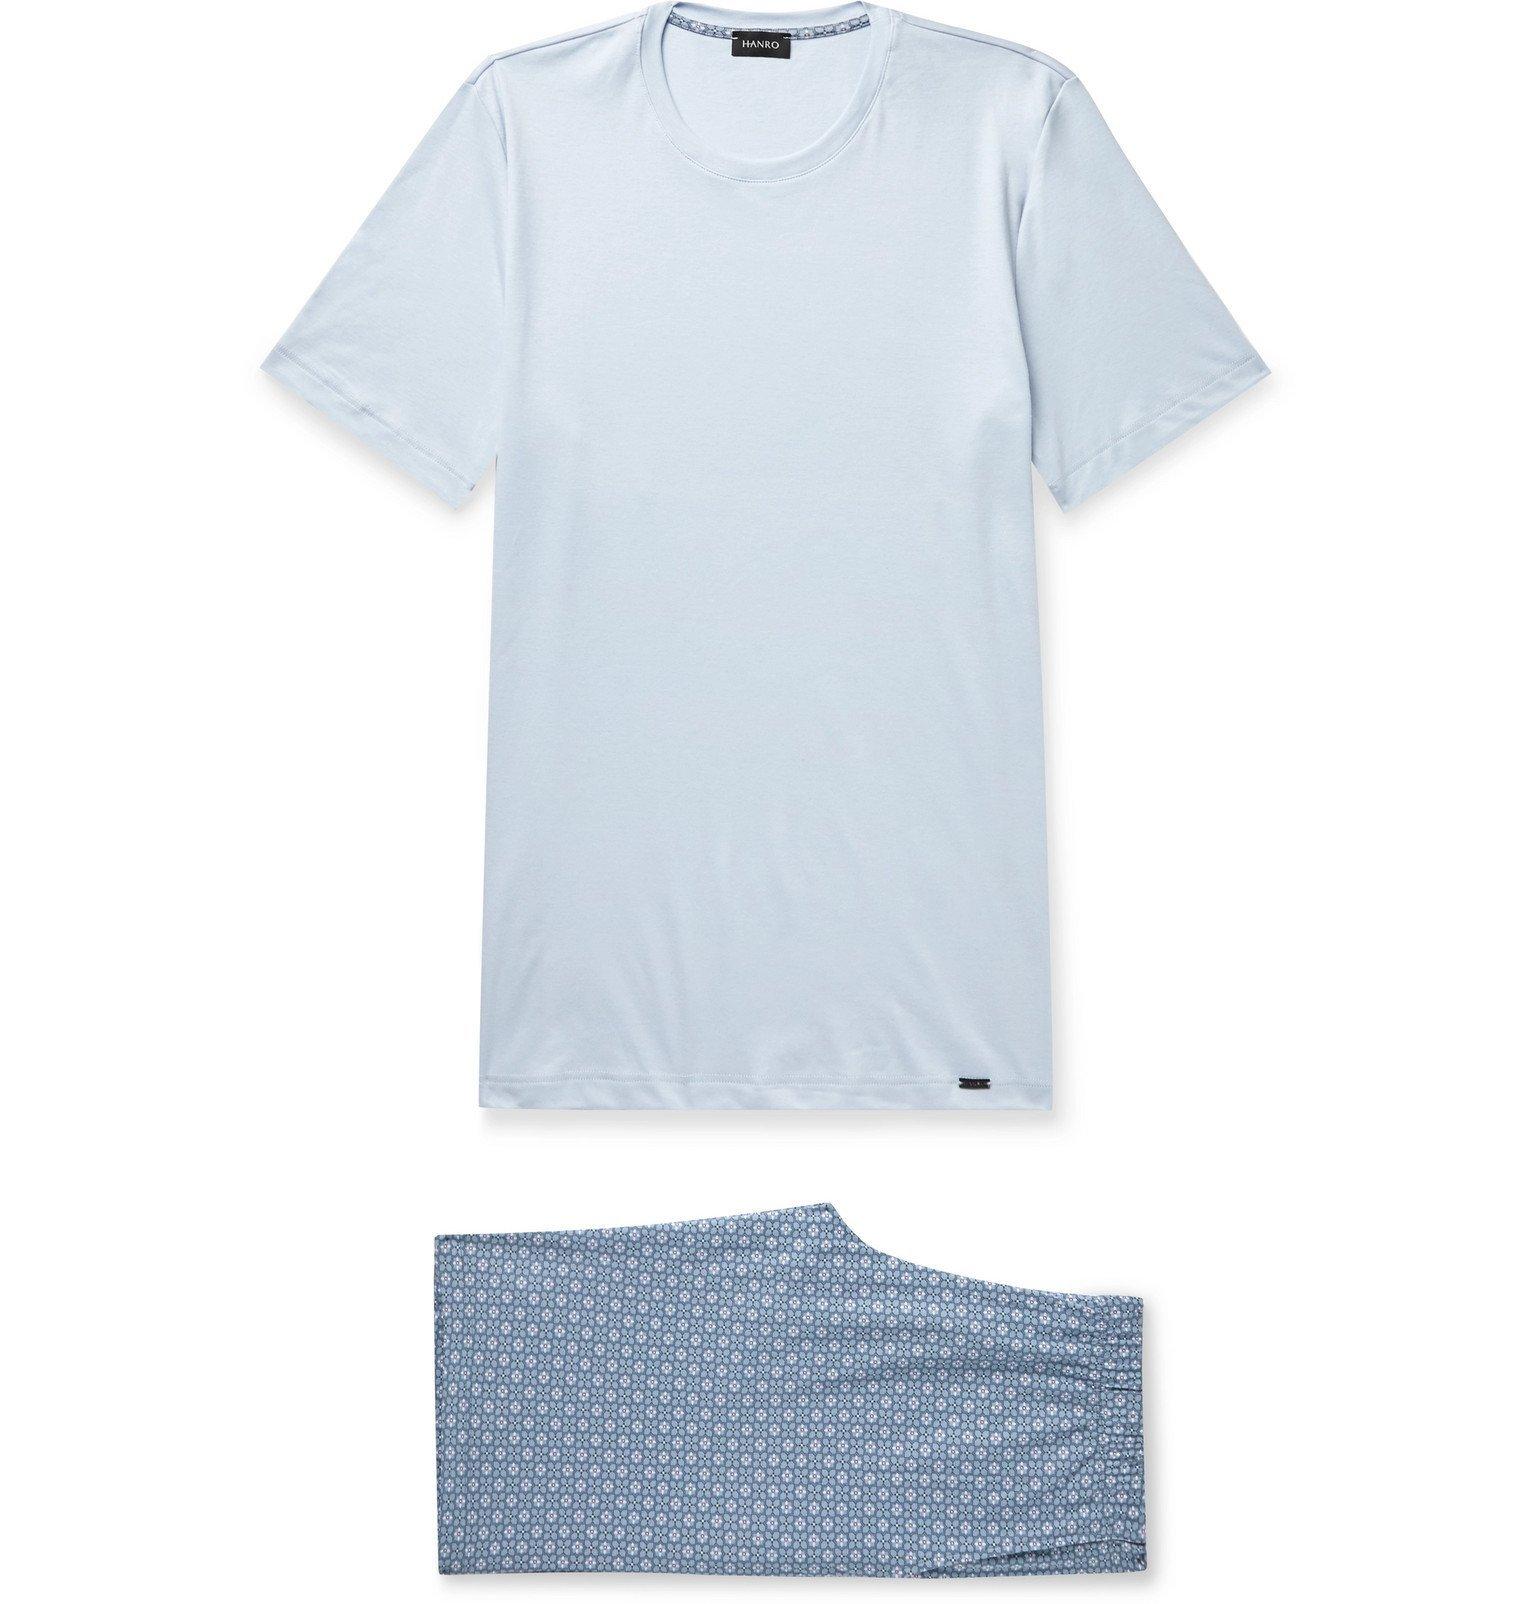 Hanro - Cotton-Jersey Pyjama Set - Blue